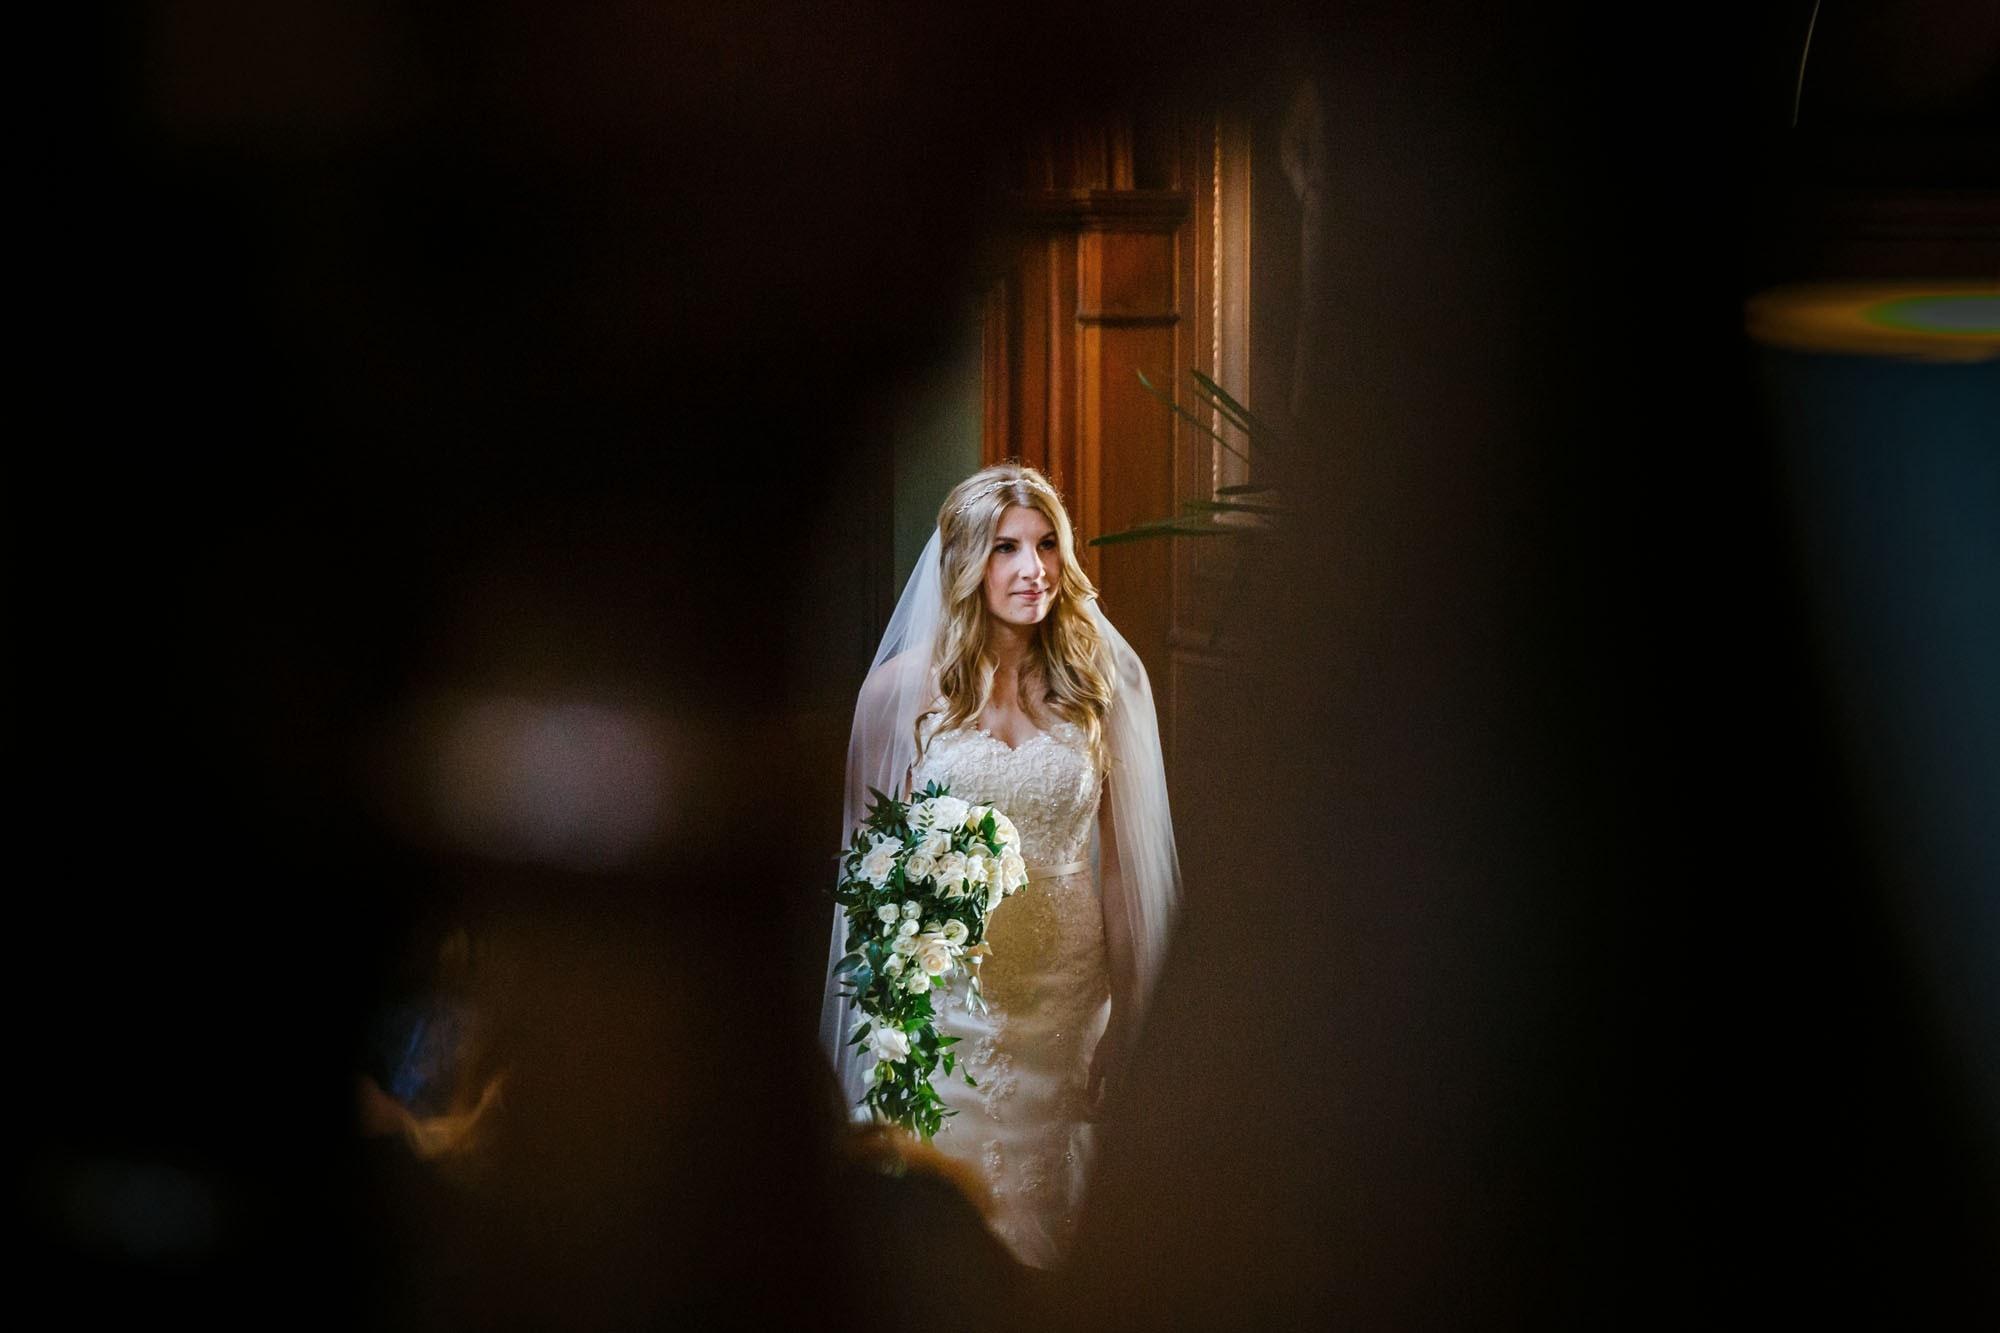 Somerleyton Hall wedding photographs of Marie & Tom